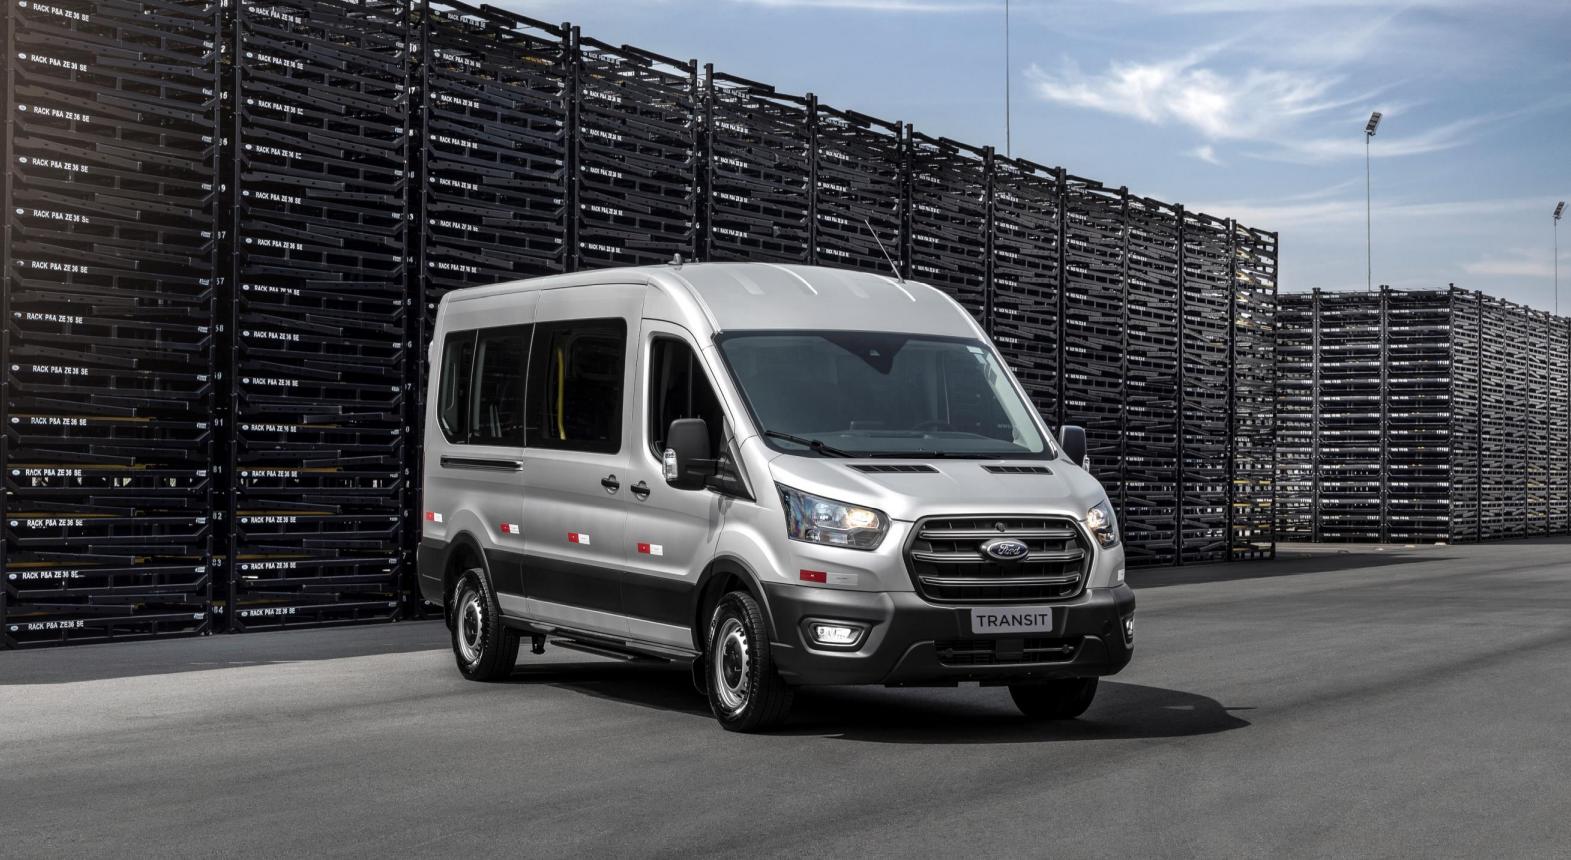 ford transit frente prata modelo curto de passageiros